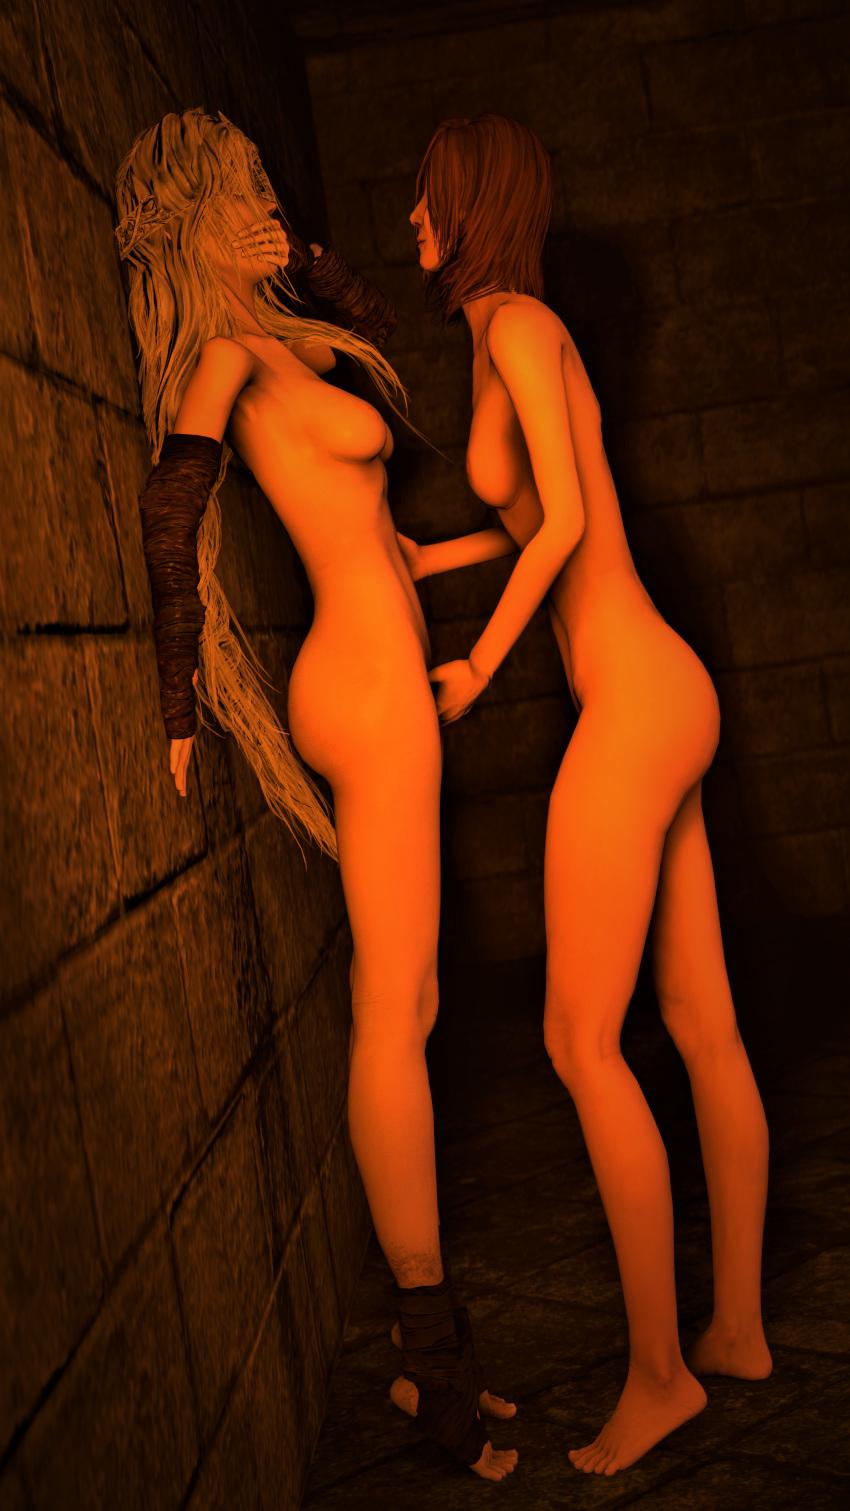 souls dancers dark 3 armor Furry giantess micro in underwear